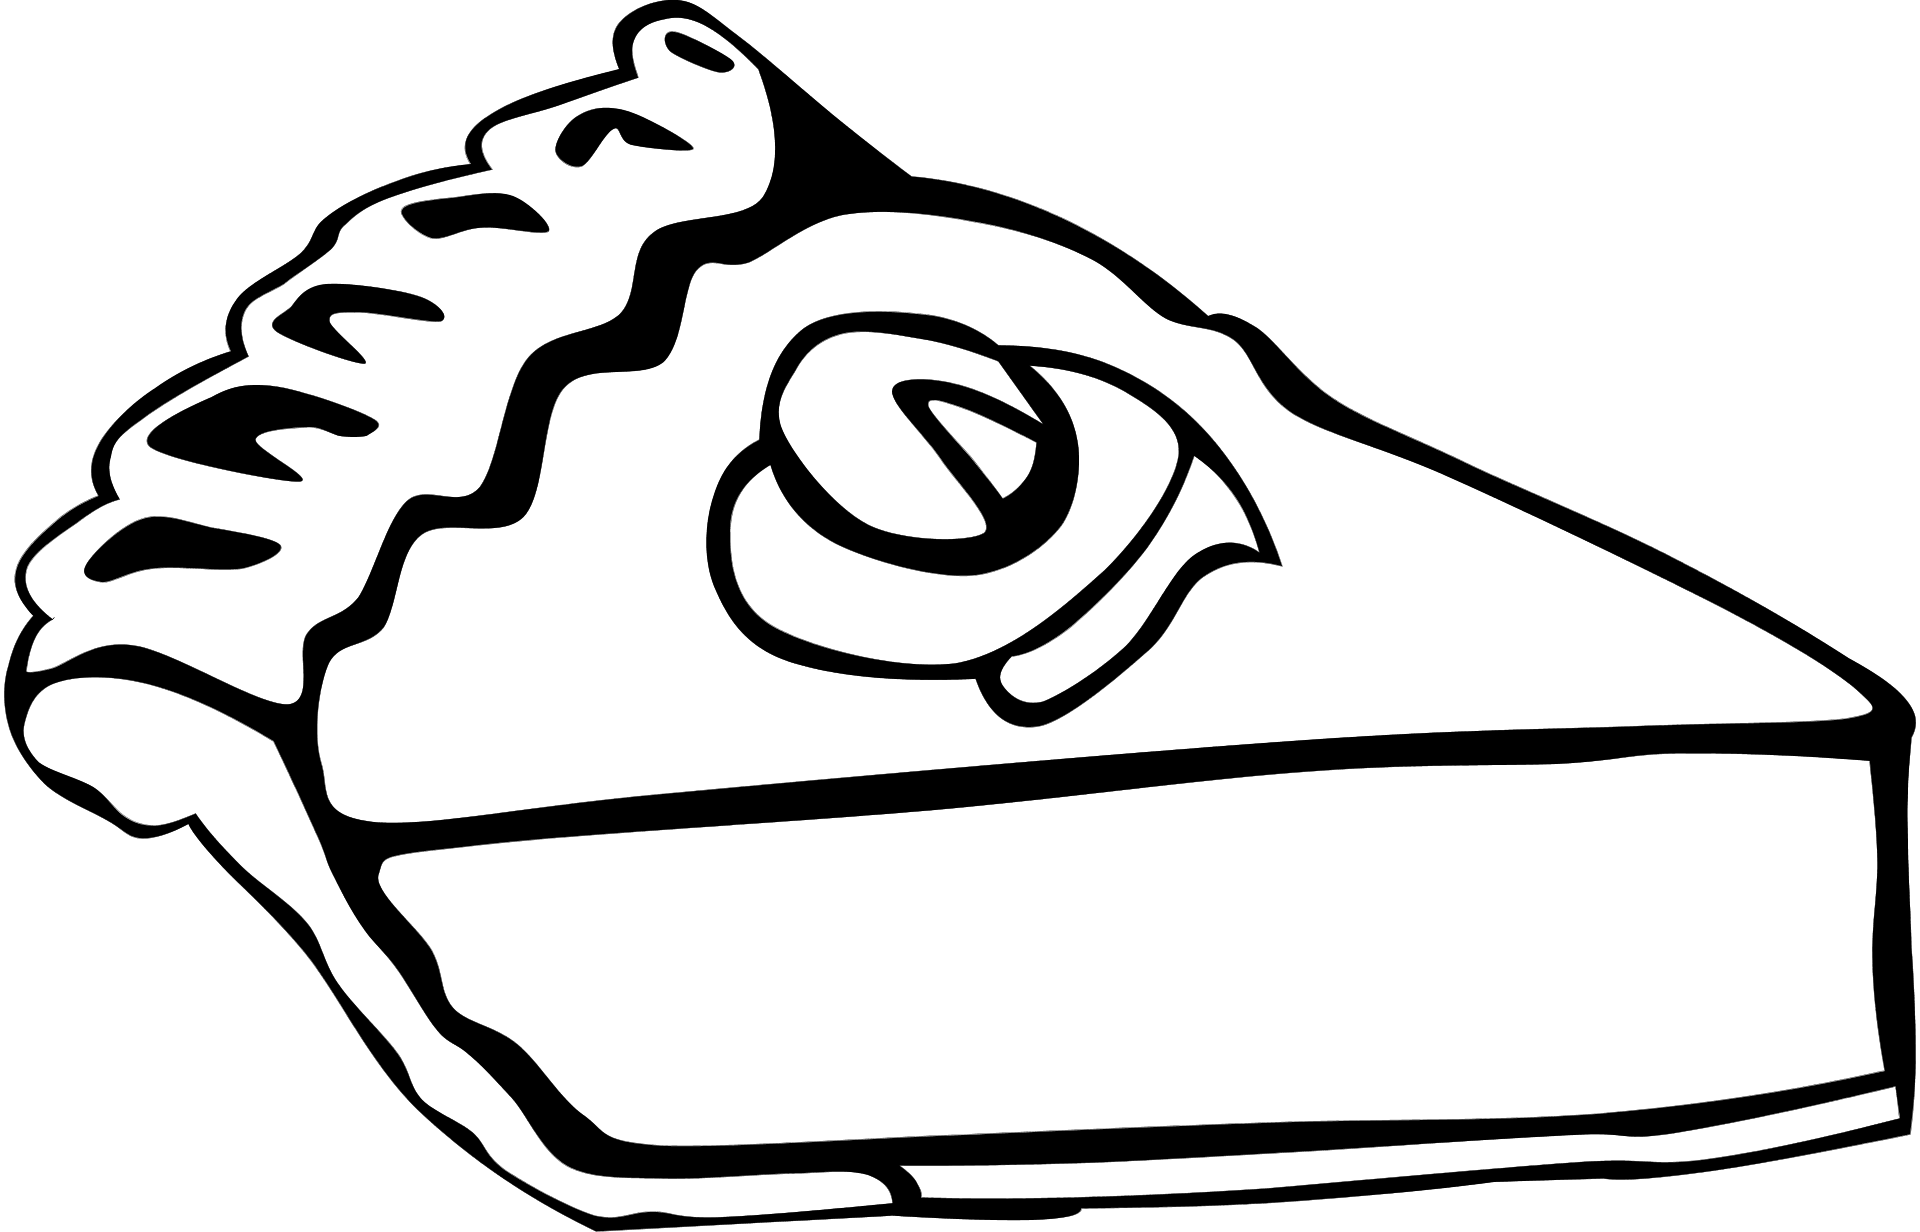 Free Dessert Cliparts Black, Download Free Clip Art, Free Clip Art.